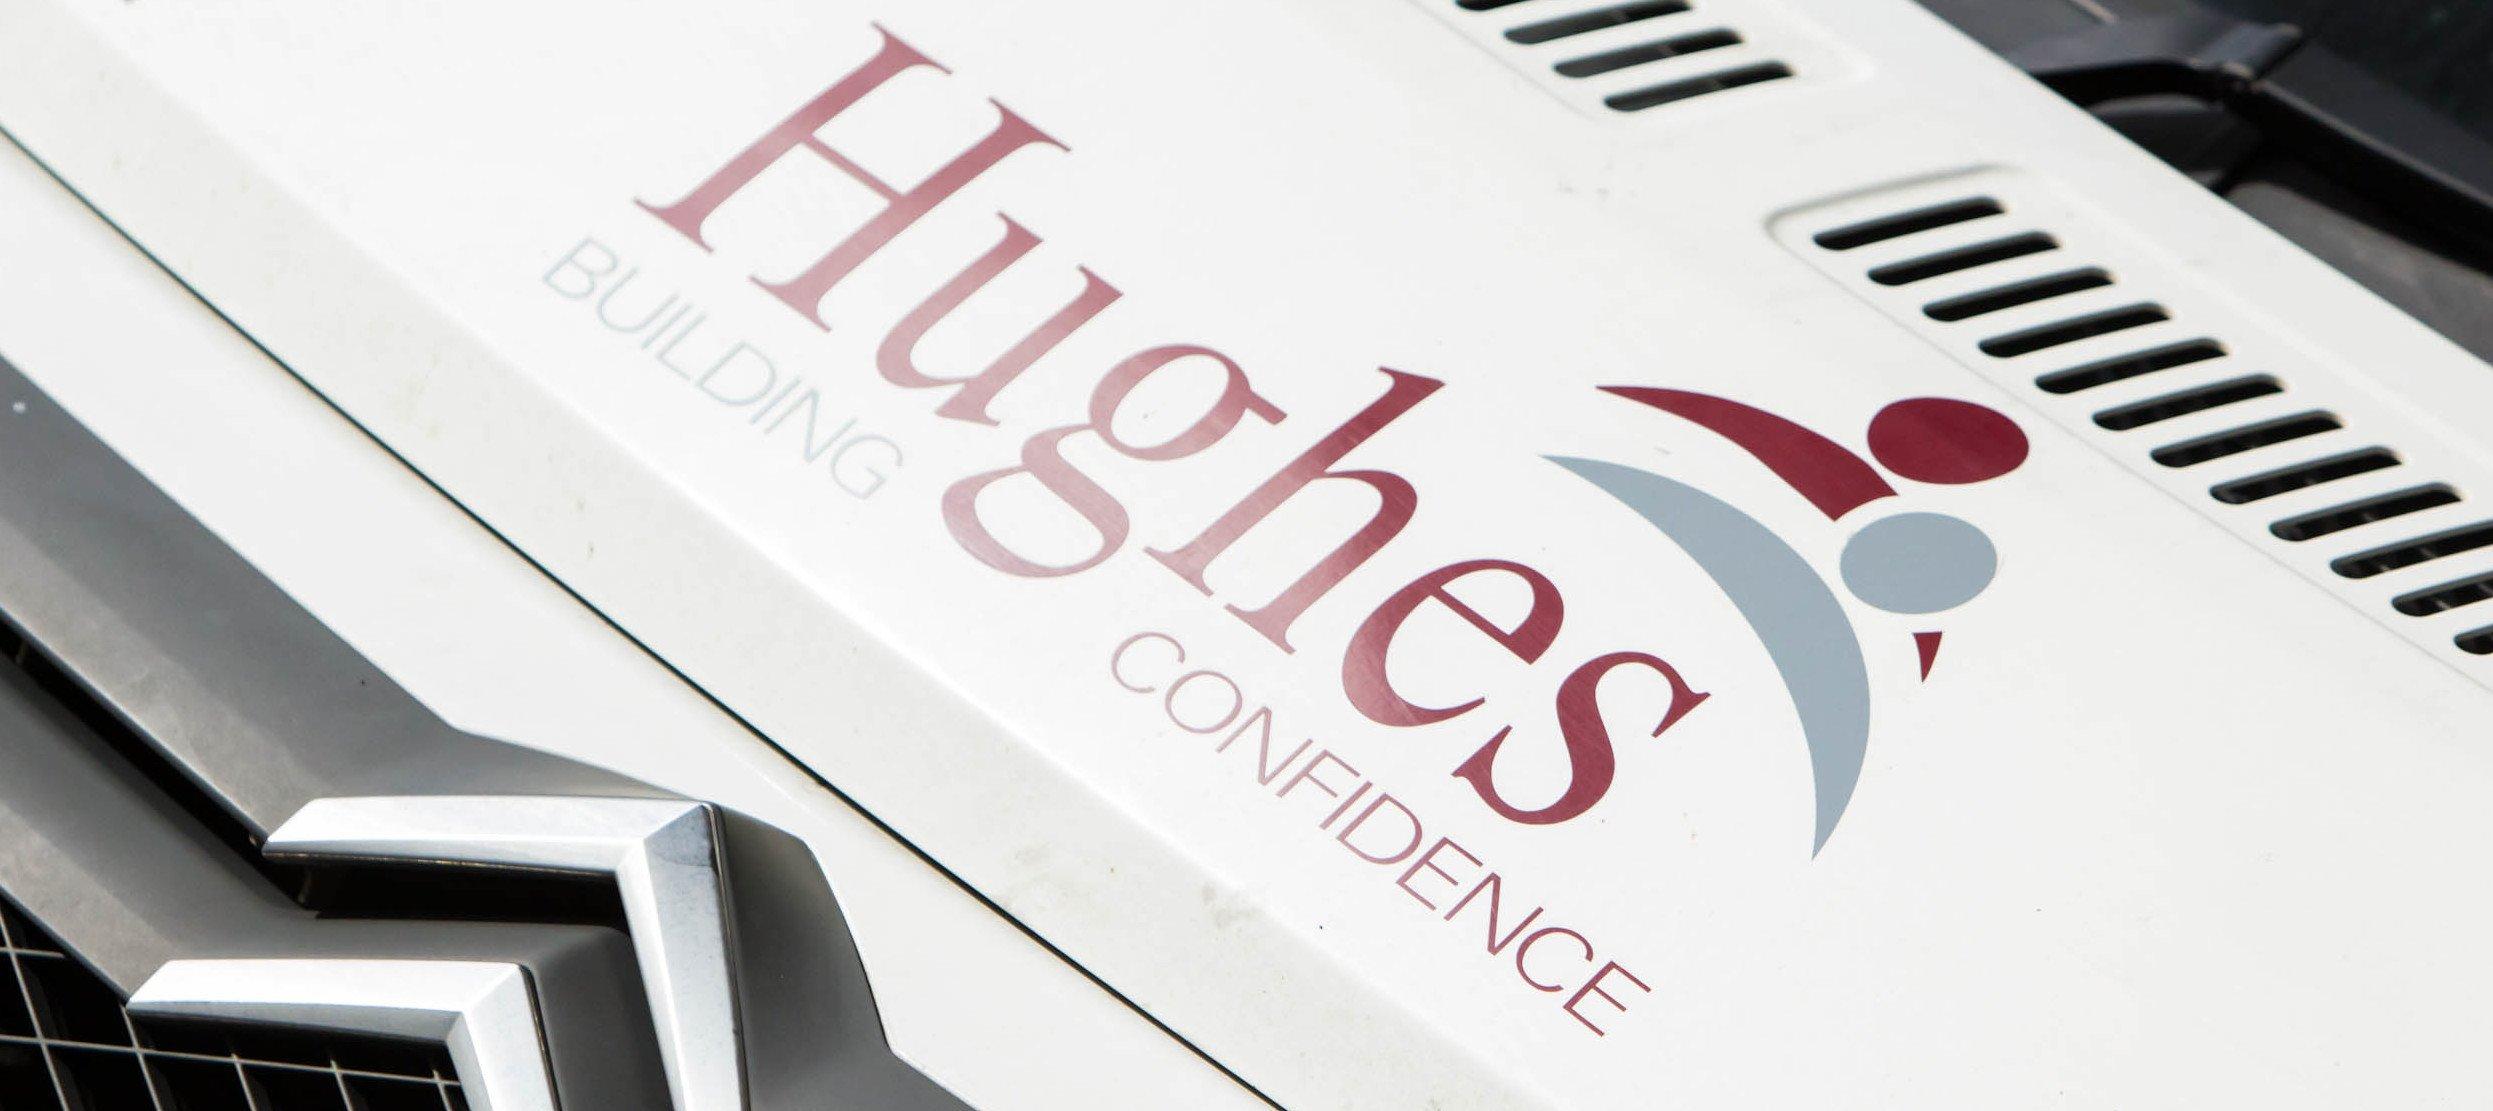 Hughes - Building Confidence